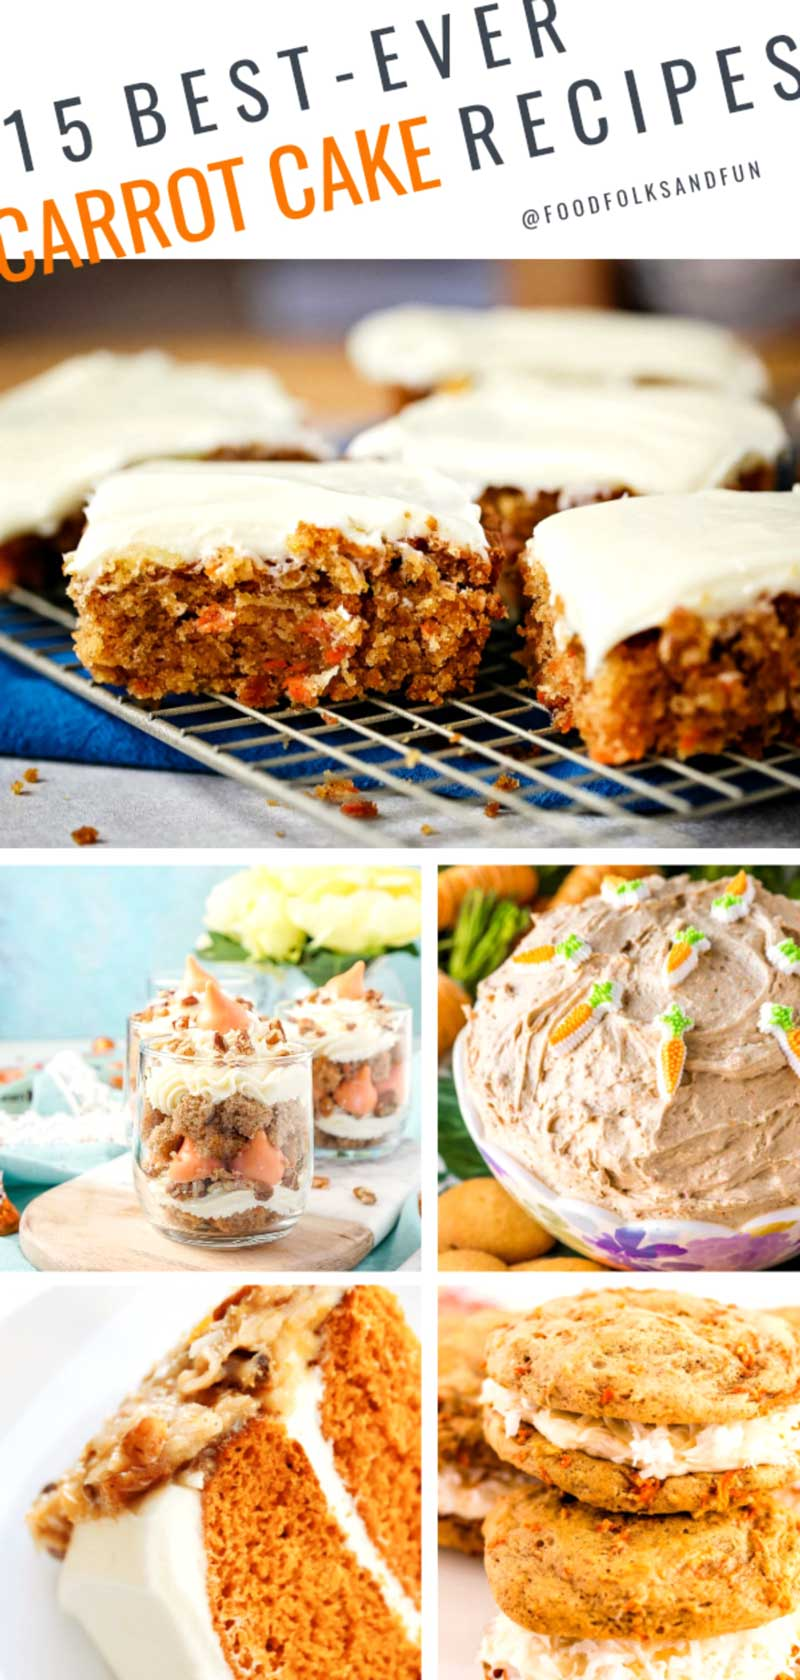 Differnt ways to make carrot cake.